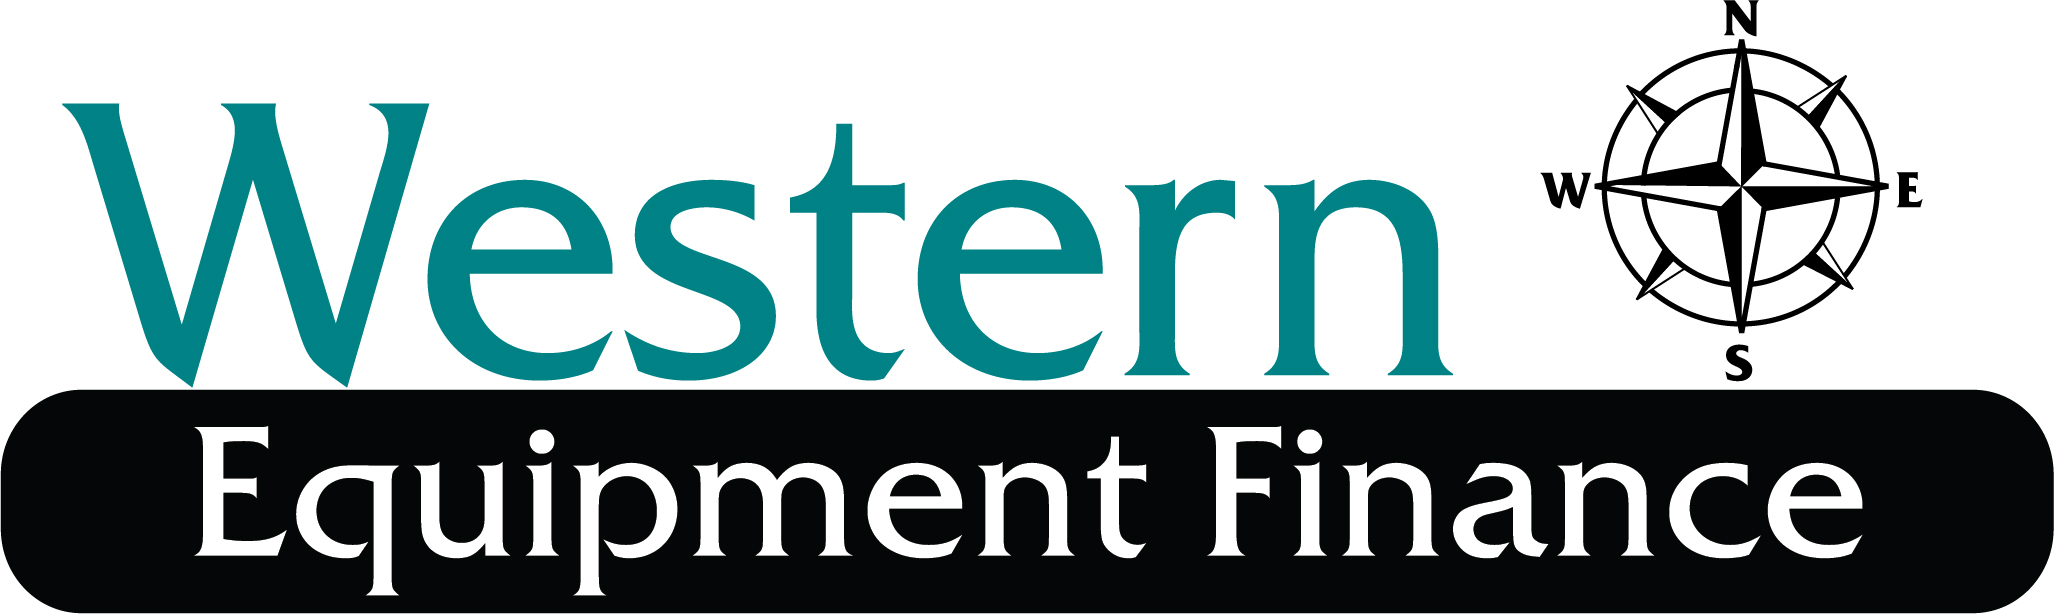 Western Equipment Finance Logo